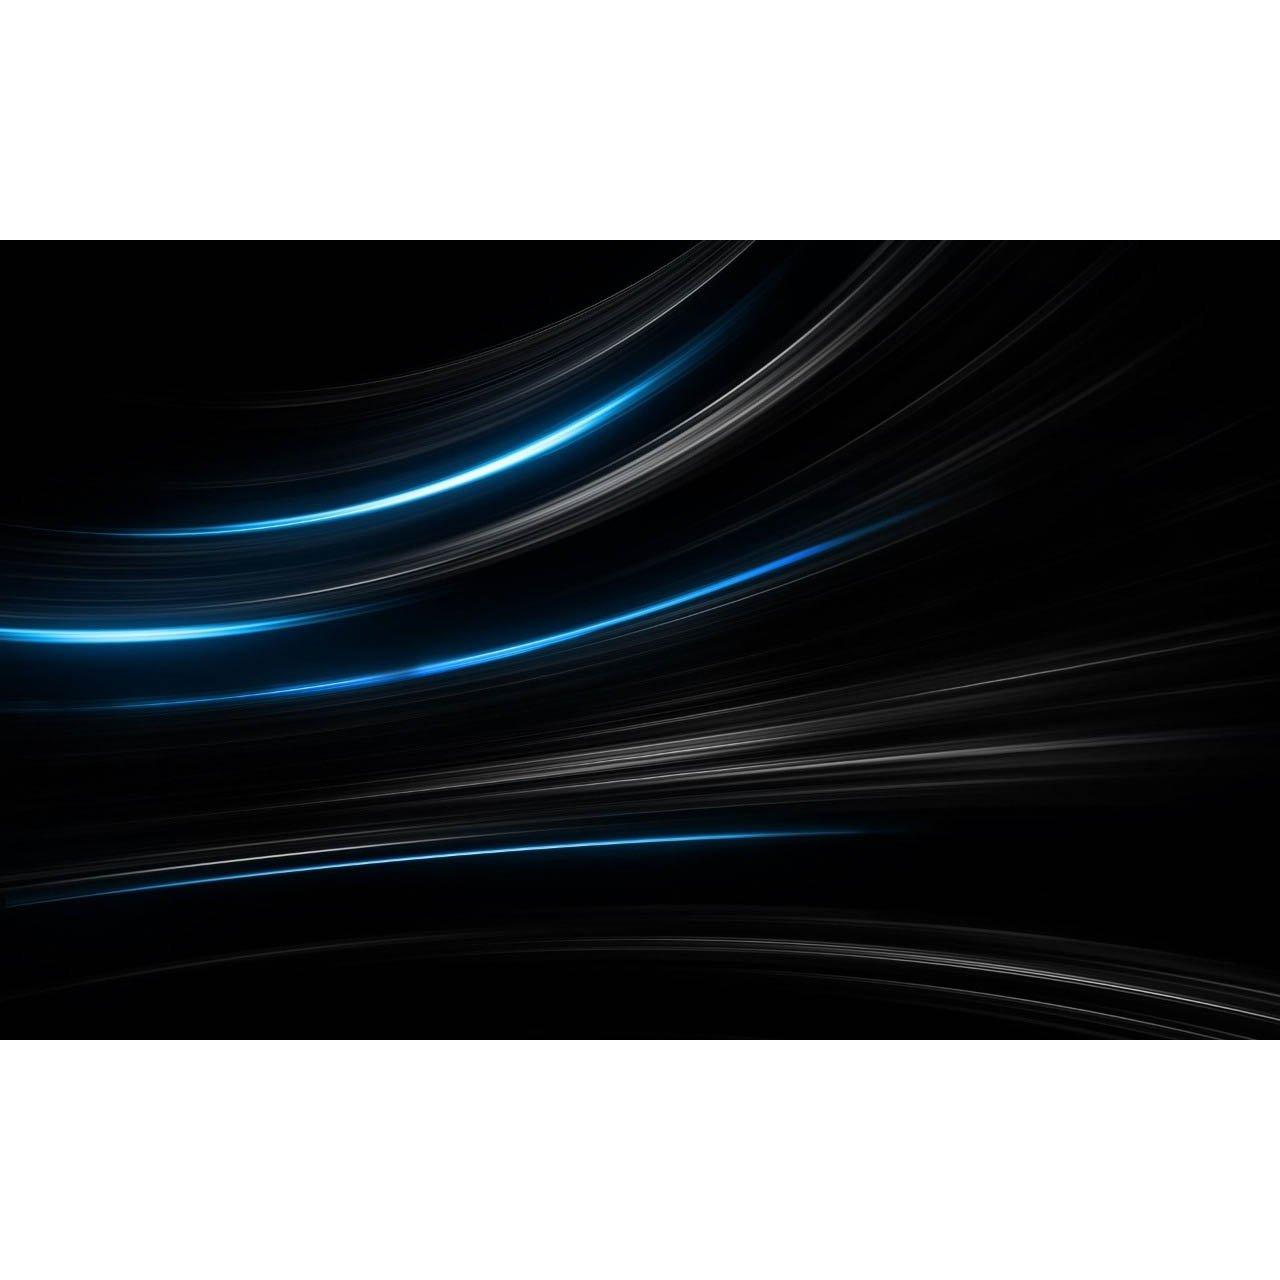 mouse pad colors 50818 2000 202595 4